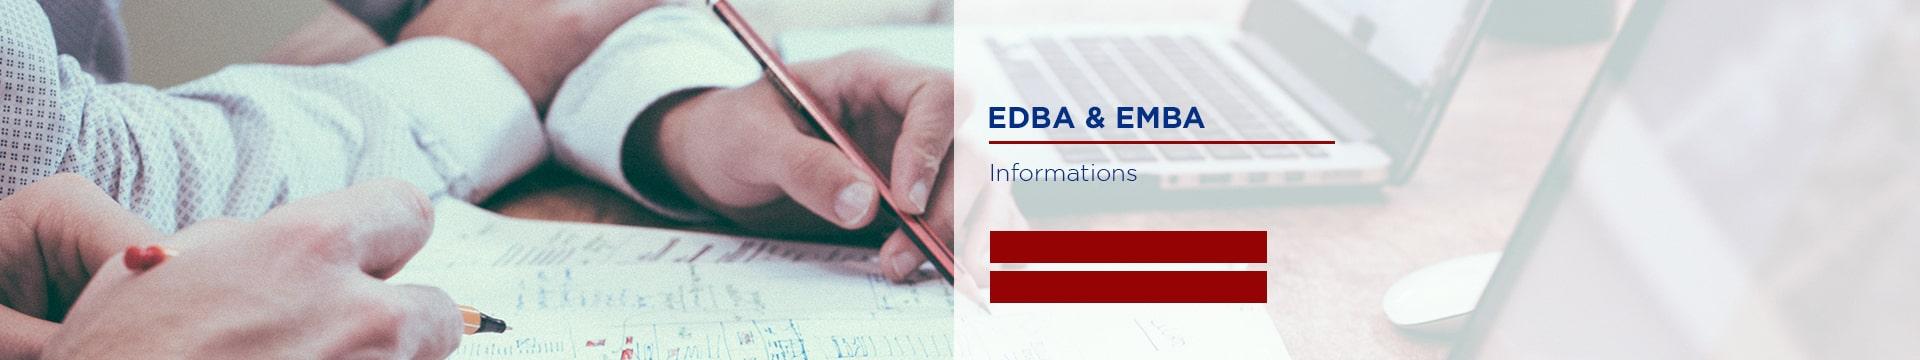 EDBA & EMBA - Informations diplômes établissement - Montpellier Management